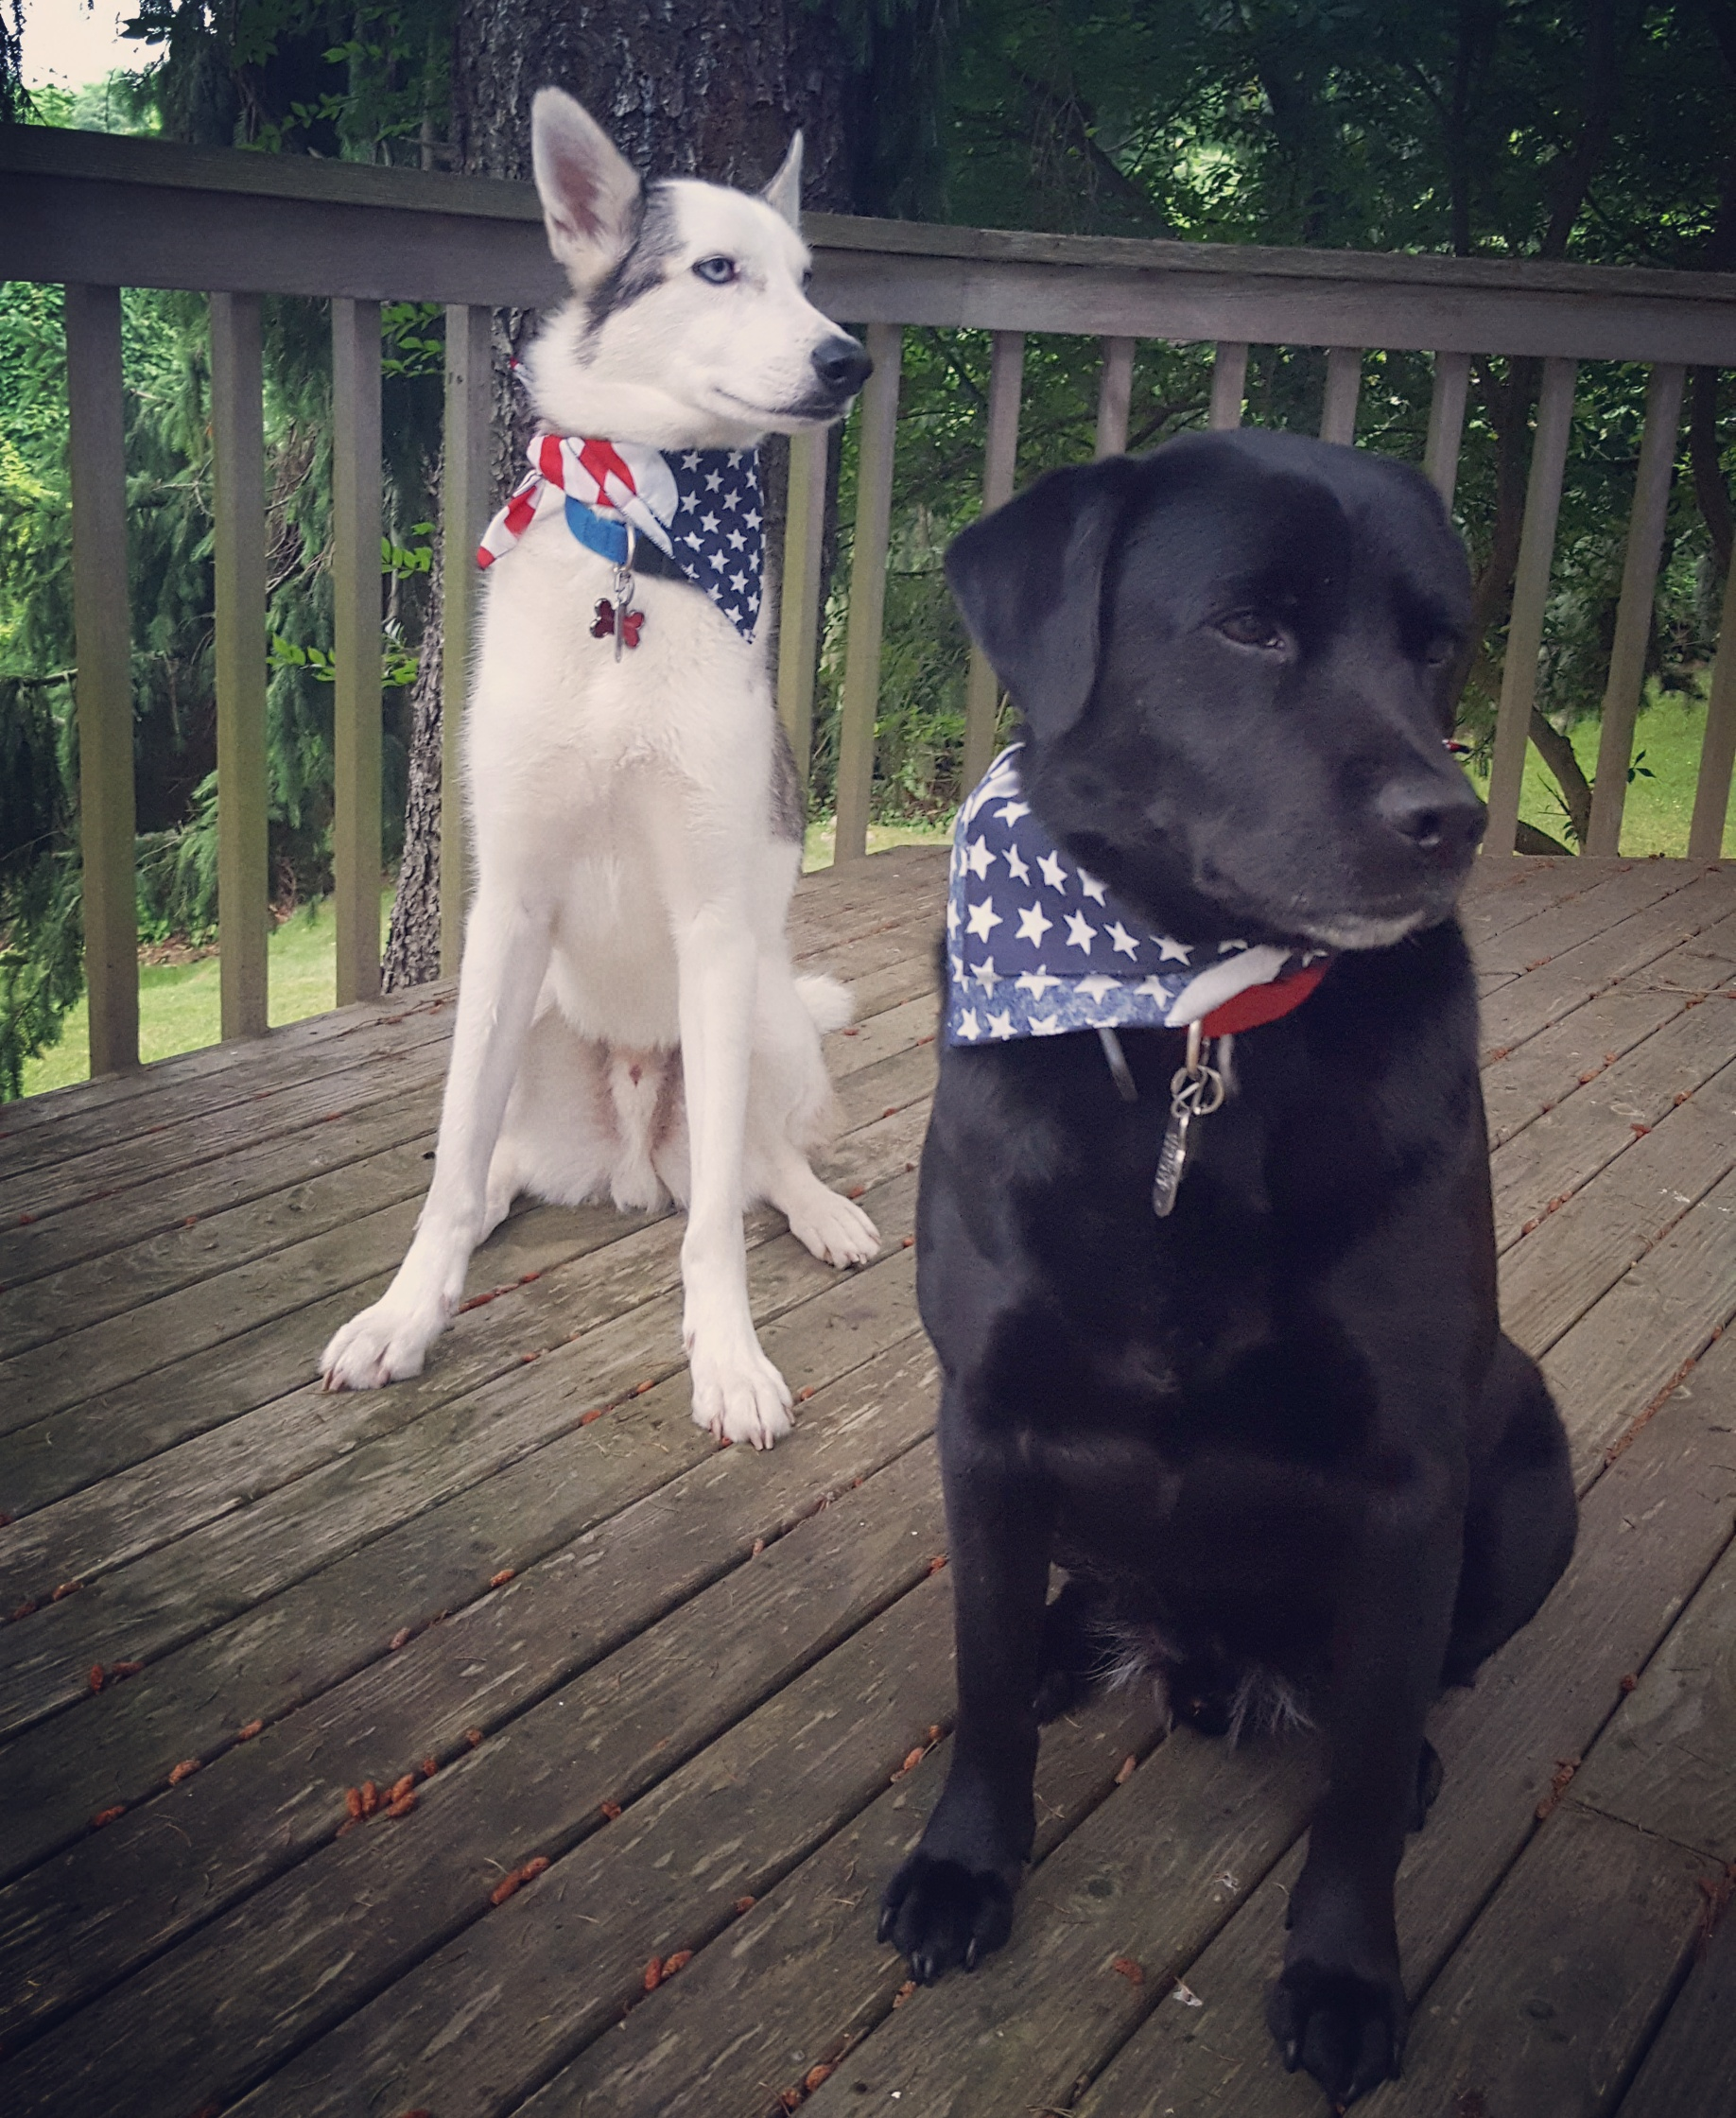 Rambo and Buddy Grunder Say Cheers to the USA